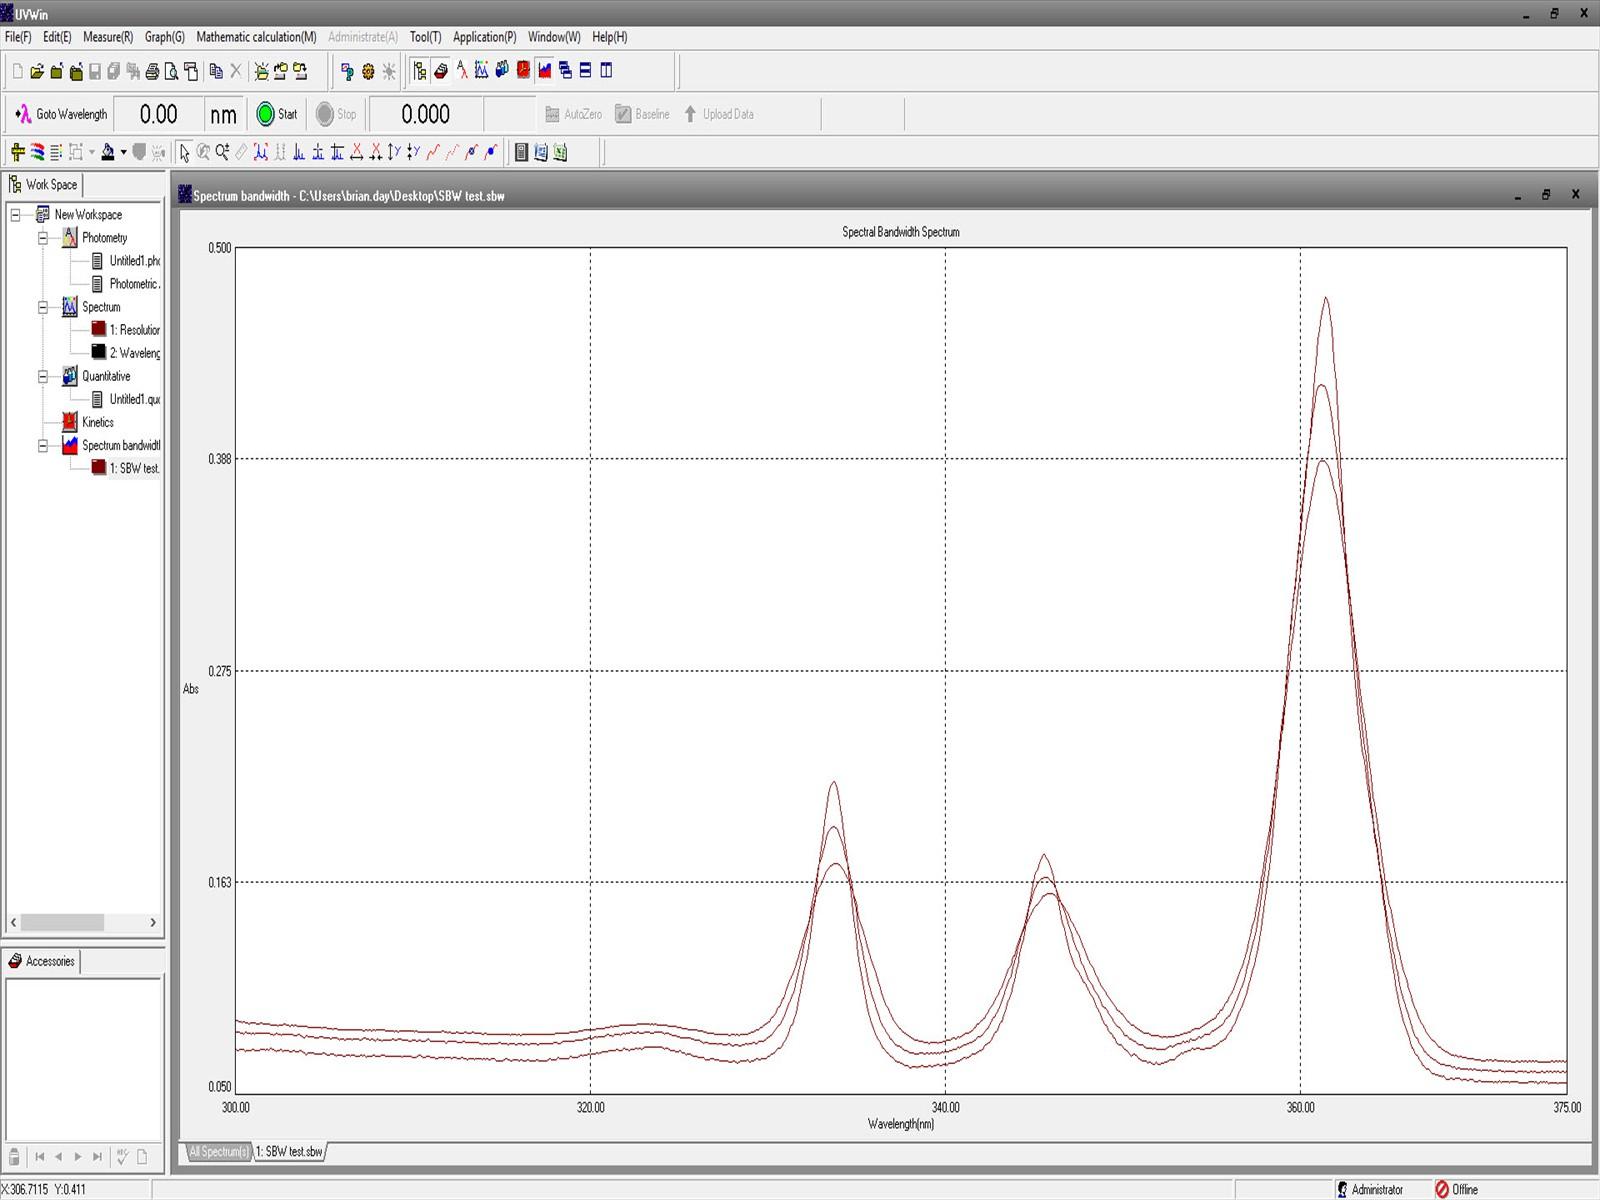 Overlay of Spectrum Bandwidth Scan